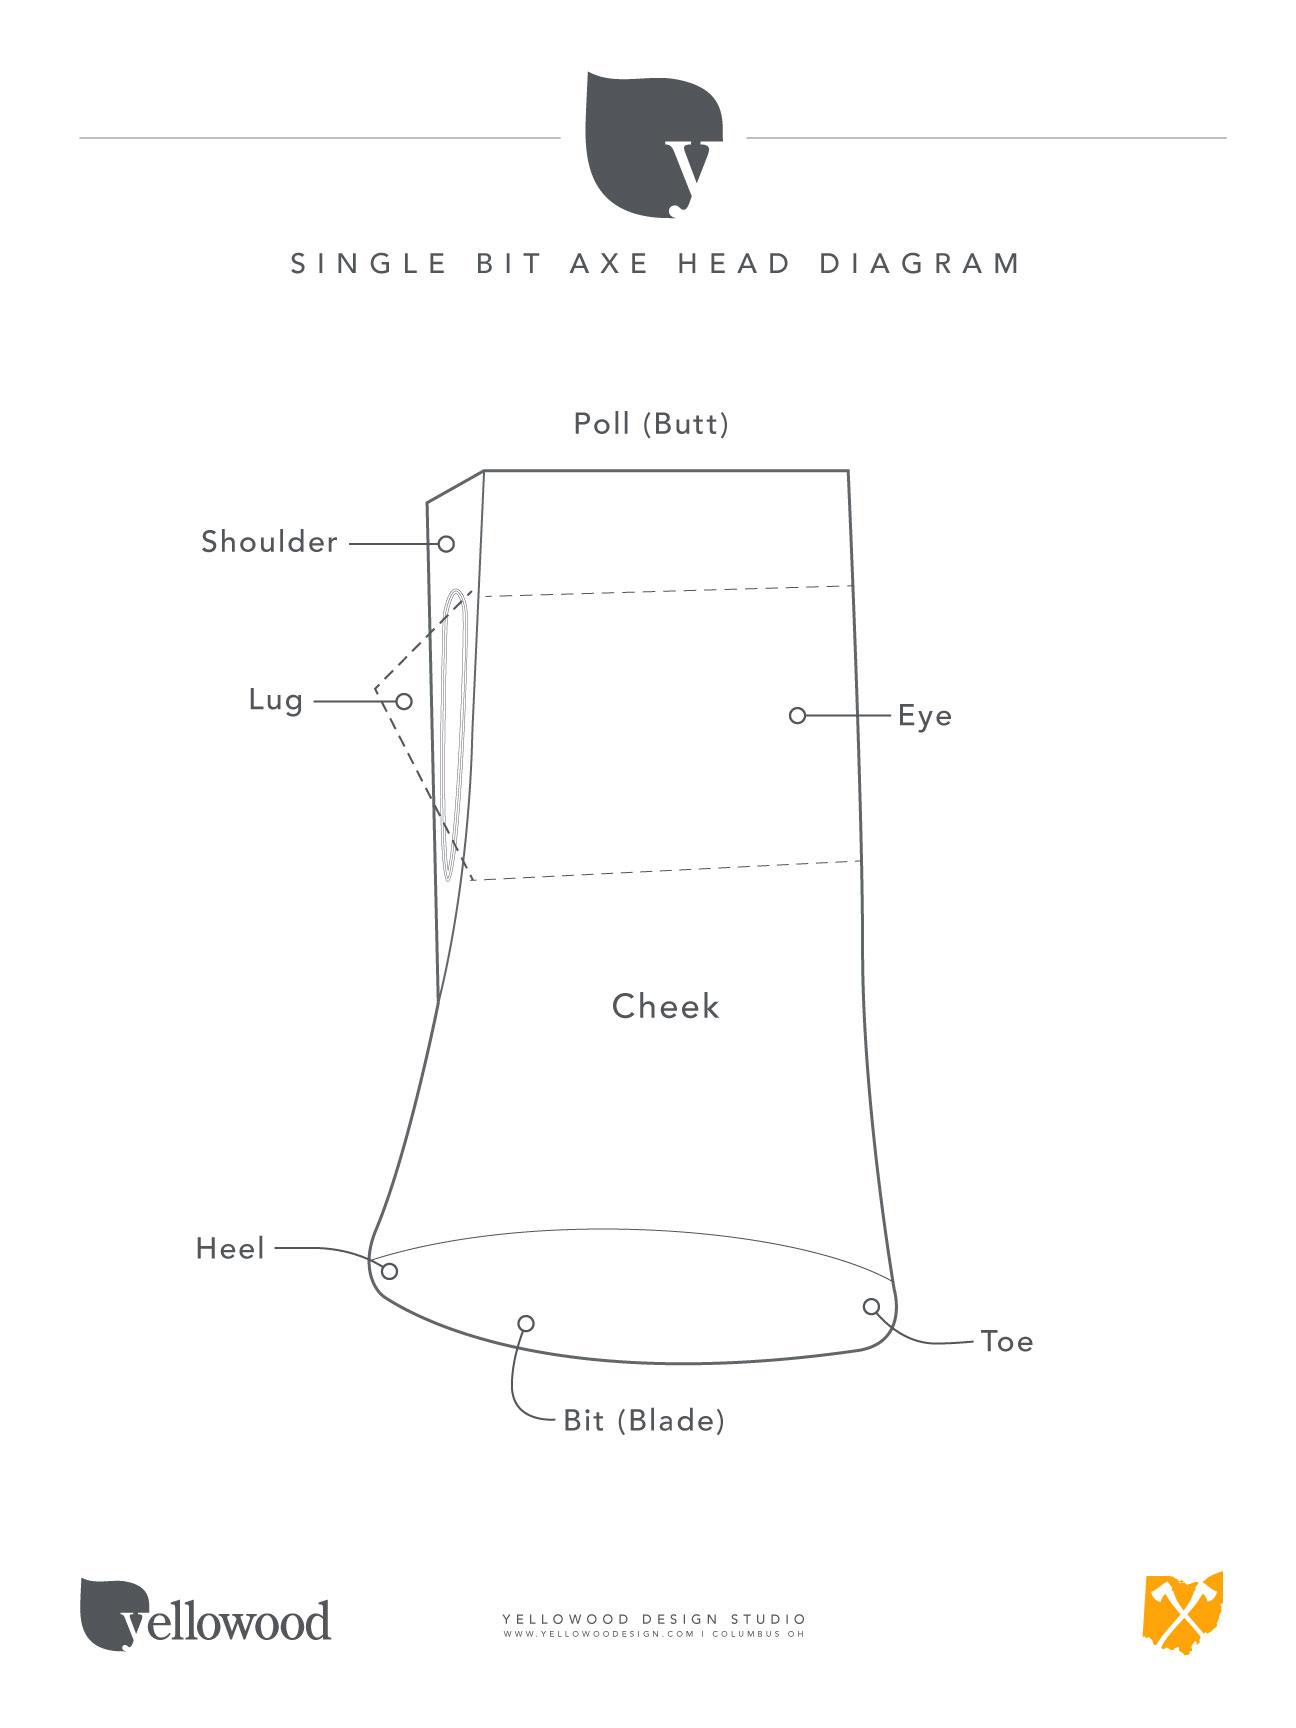 Single bit axe head diagram.